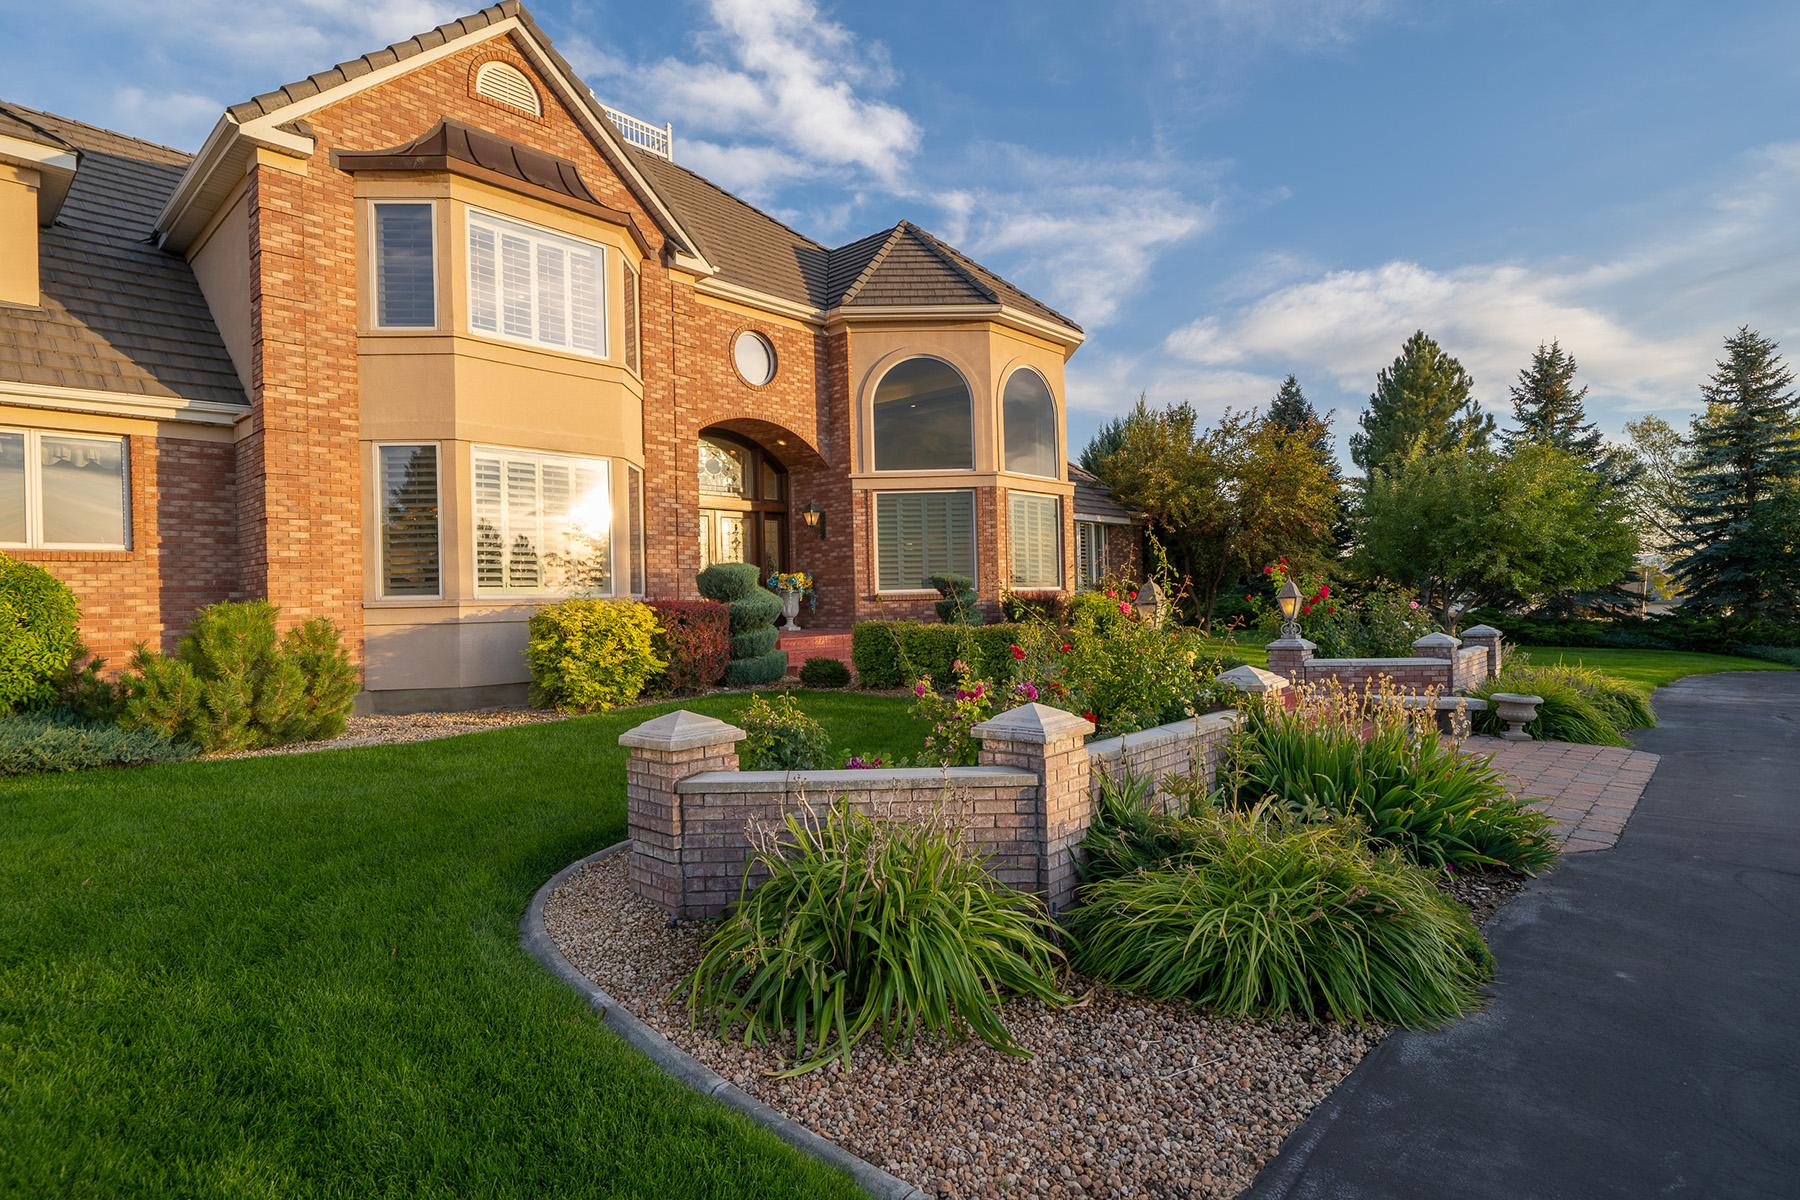 Single Family Homes for Sale at 4780 E Sagewood Dr Idaho Falls, Idaho 83406 United States